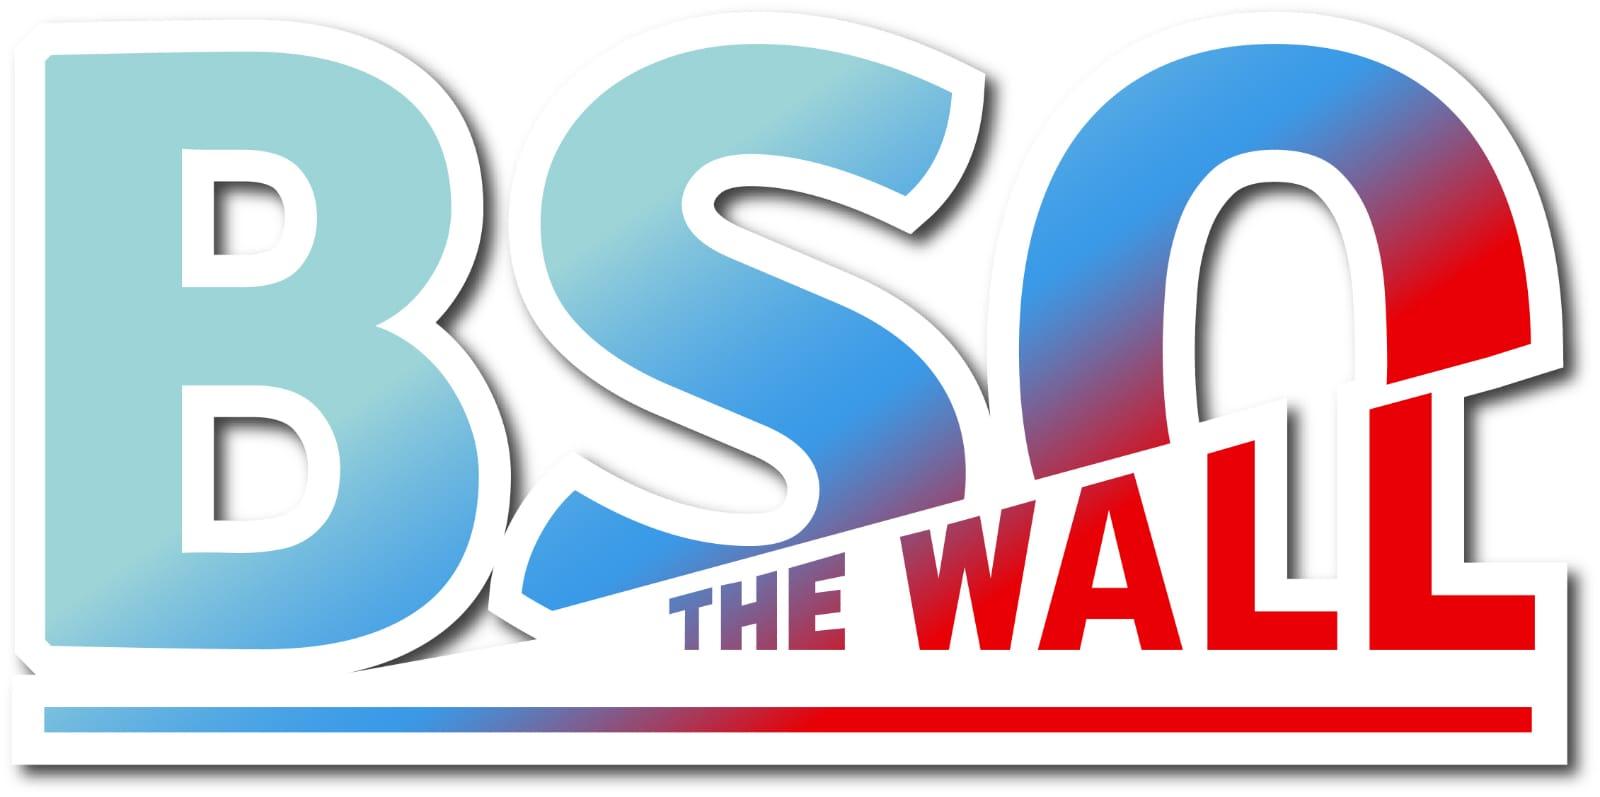 BSO The Wall logo